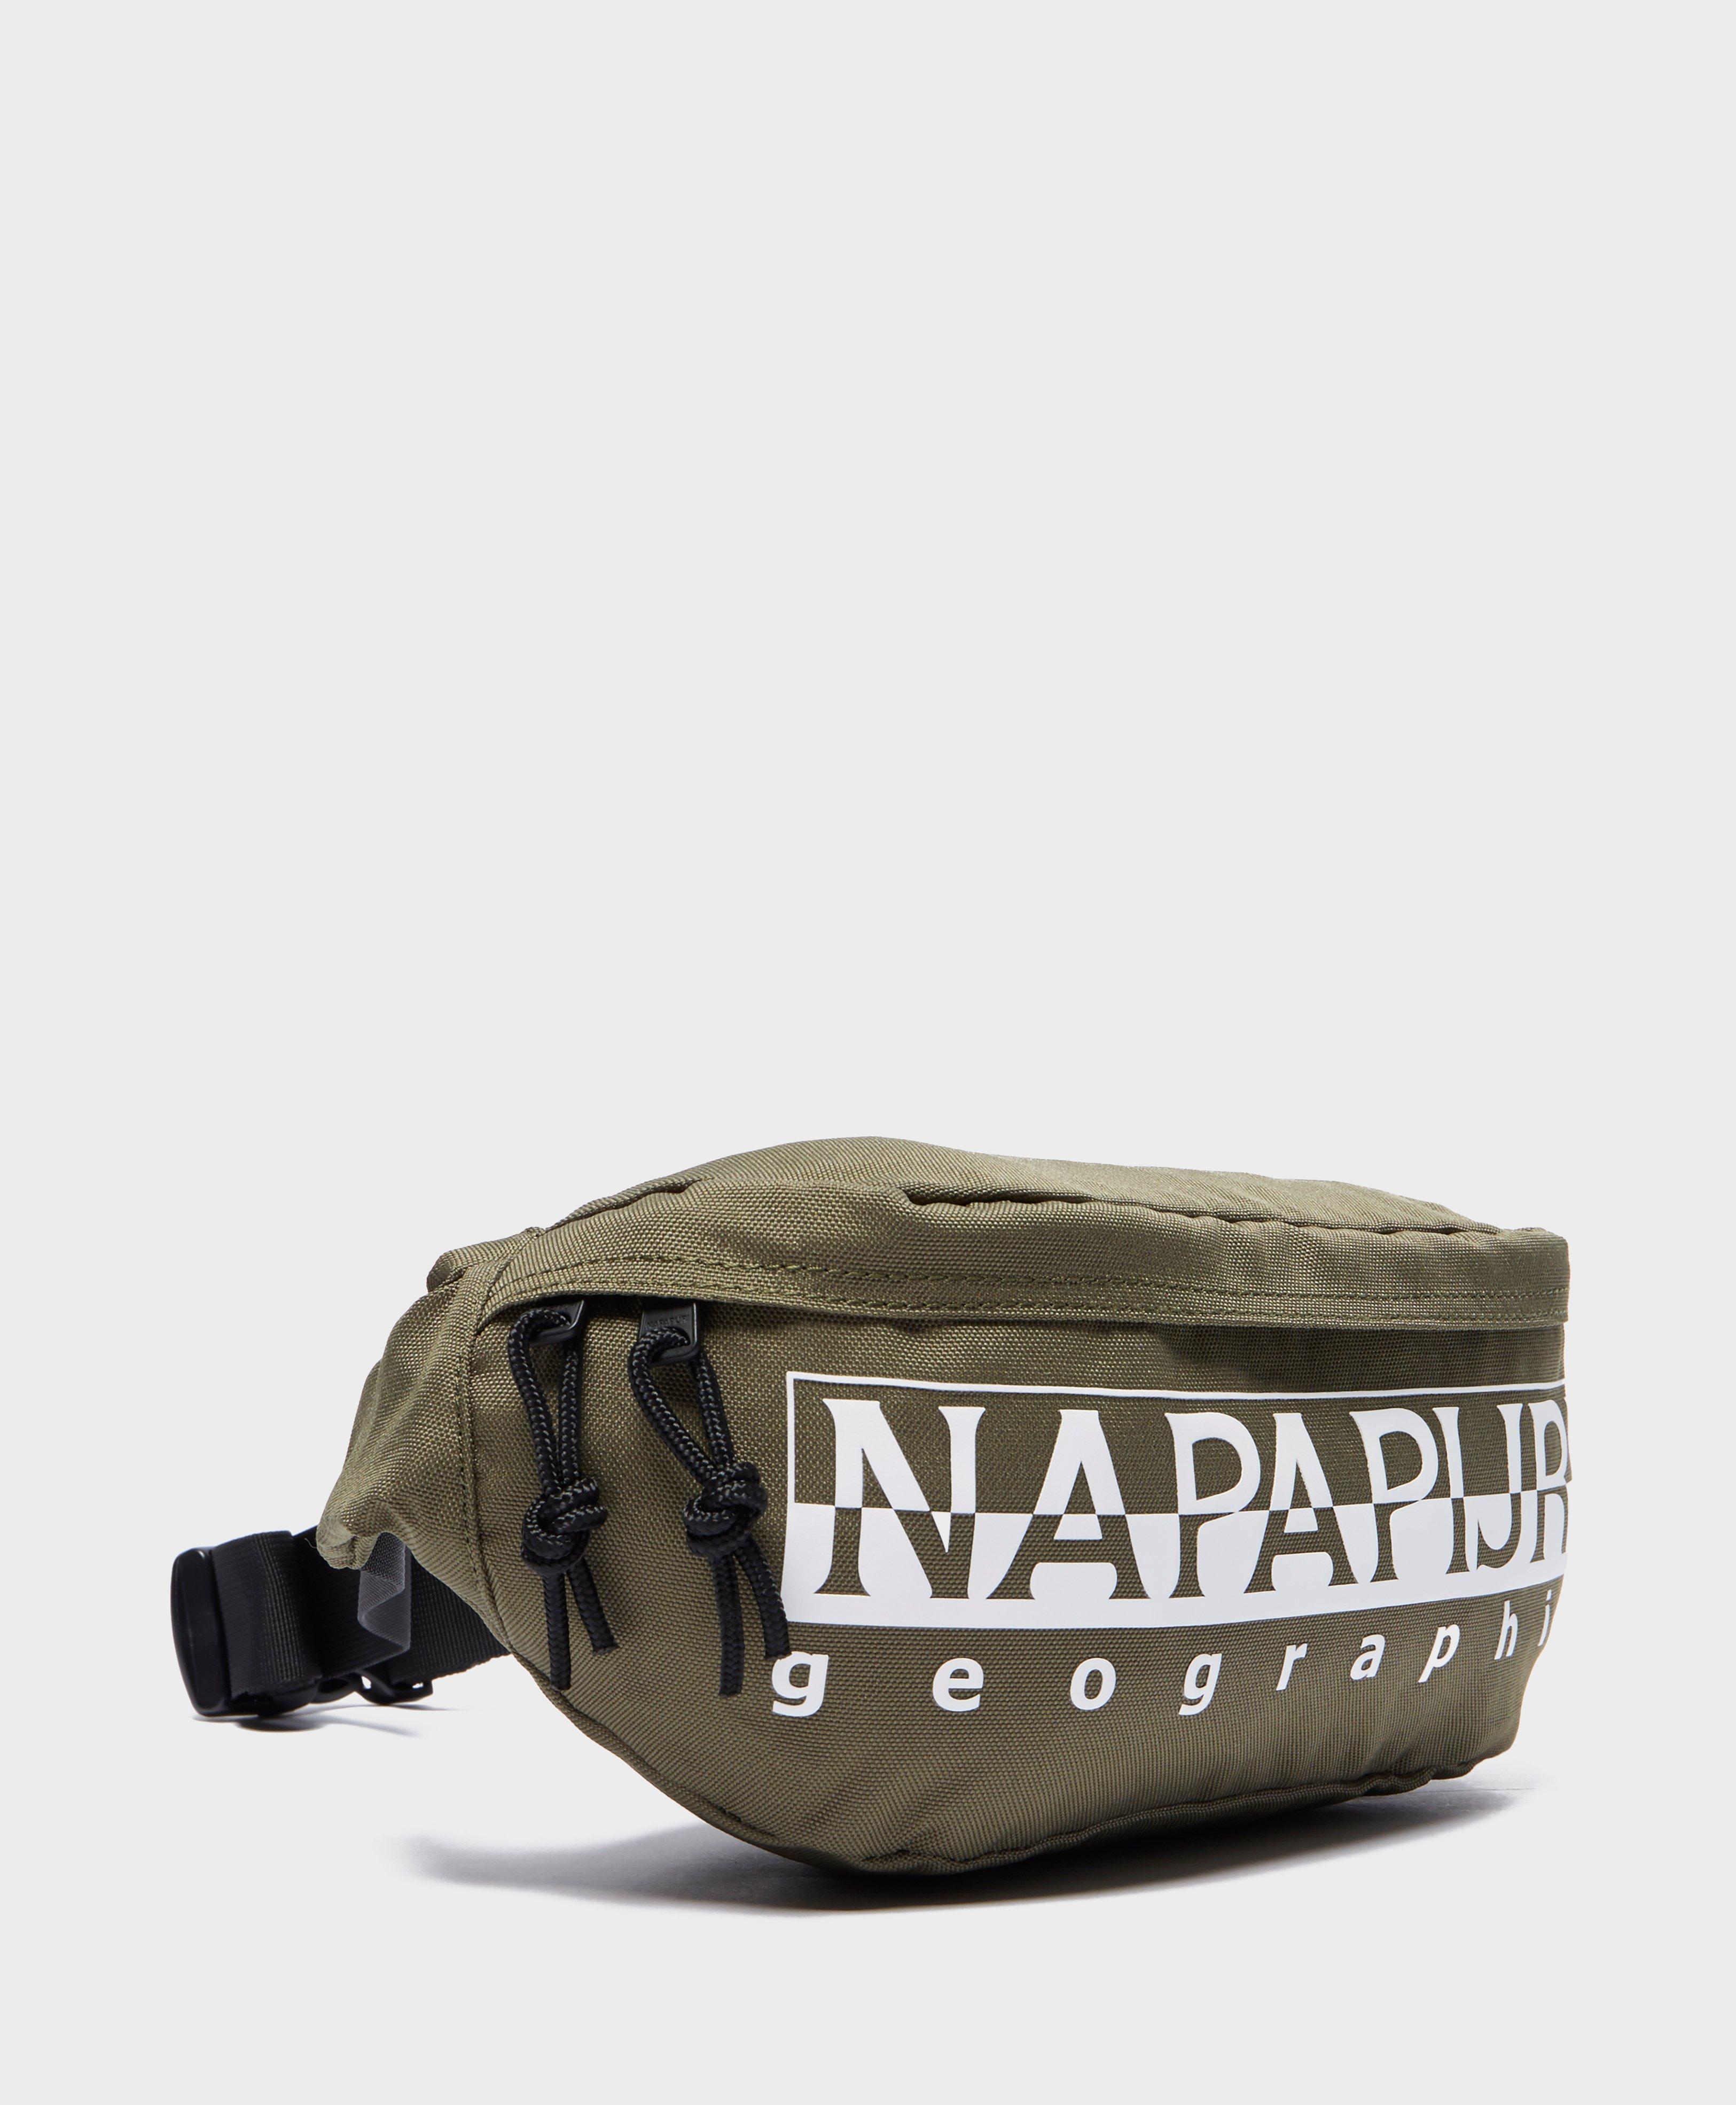 ... Napapijri Happy Day Bum Bag in Green for Men - Lyst newest 6cbf0 95257   Lyst - Adidas Originals Crossbody ... a92ae126f17b7